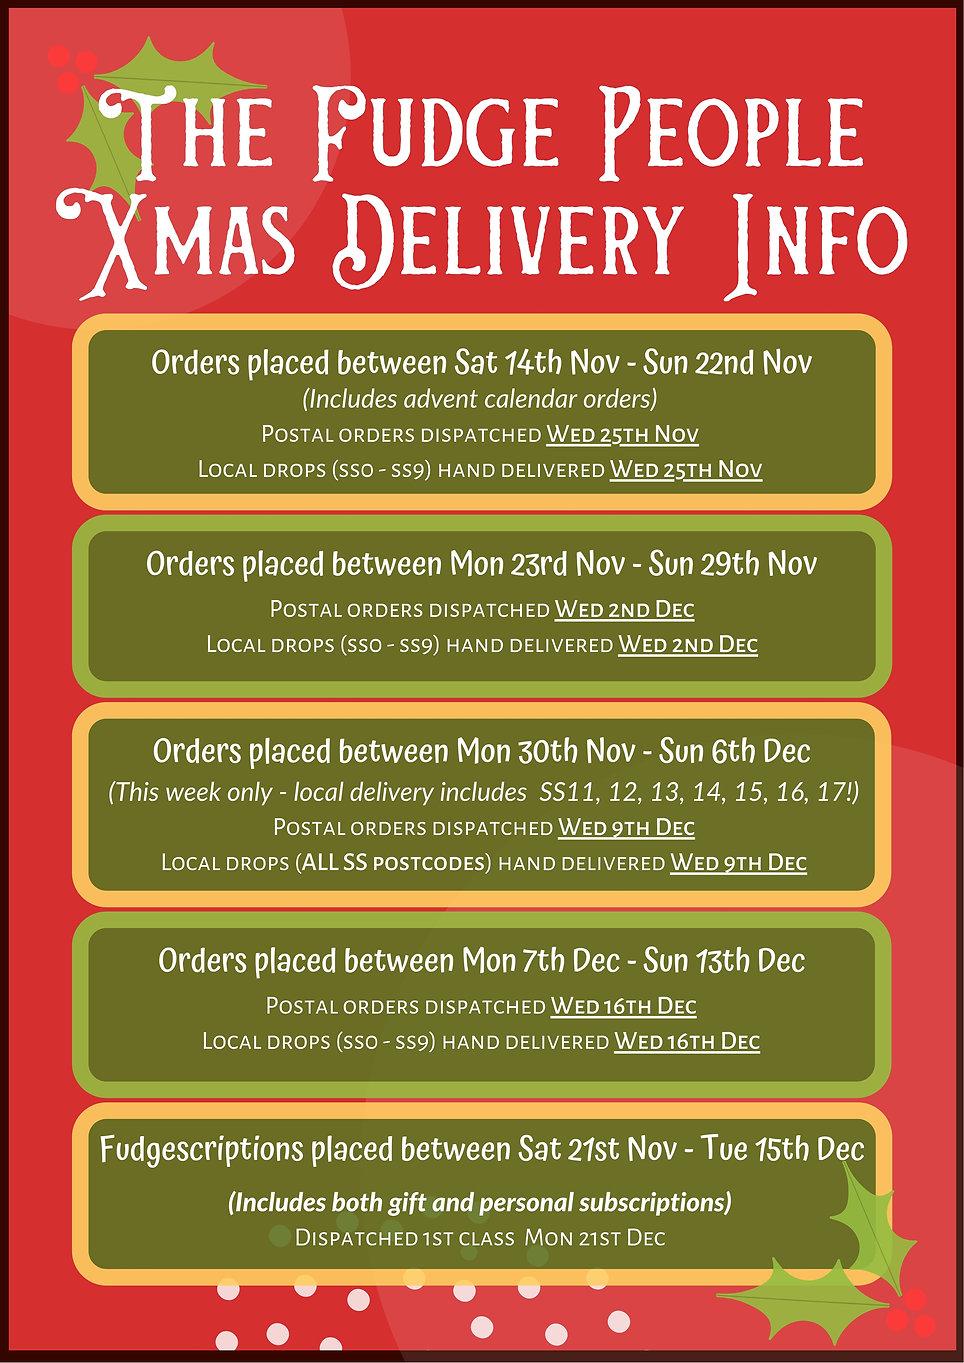 Xmas Delivery Info.jpg